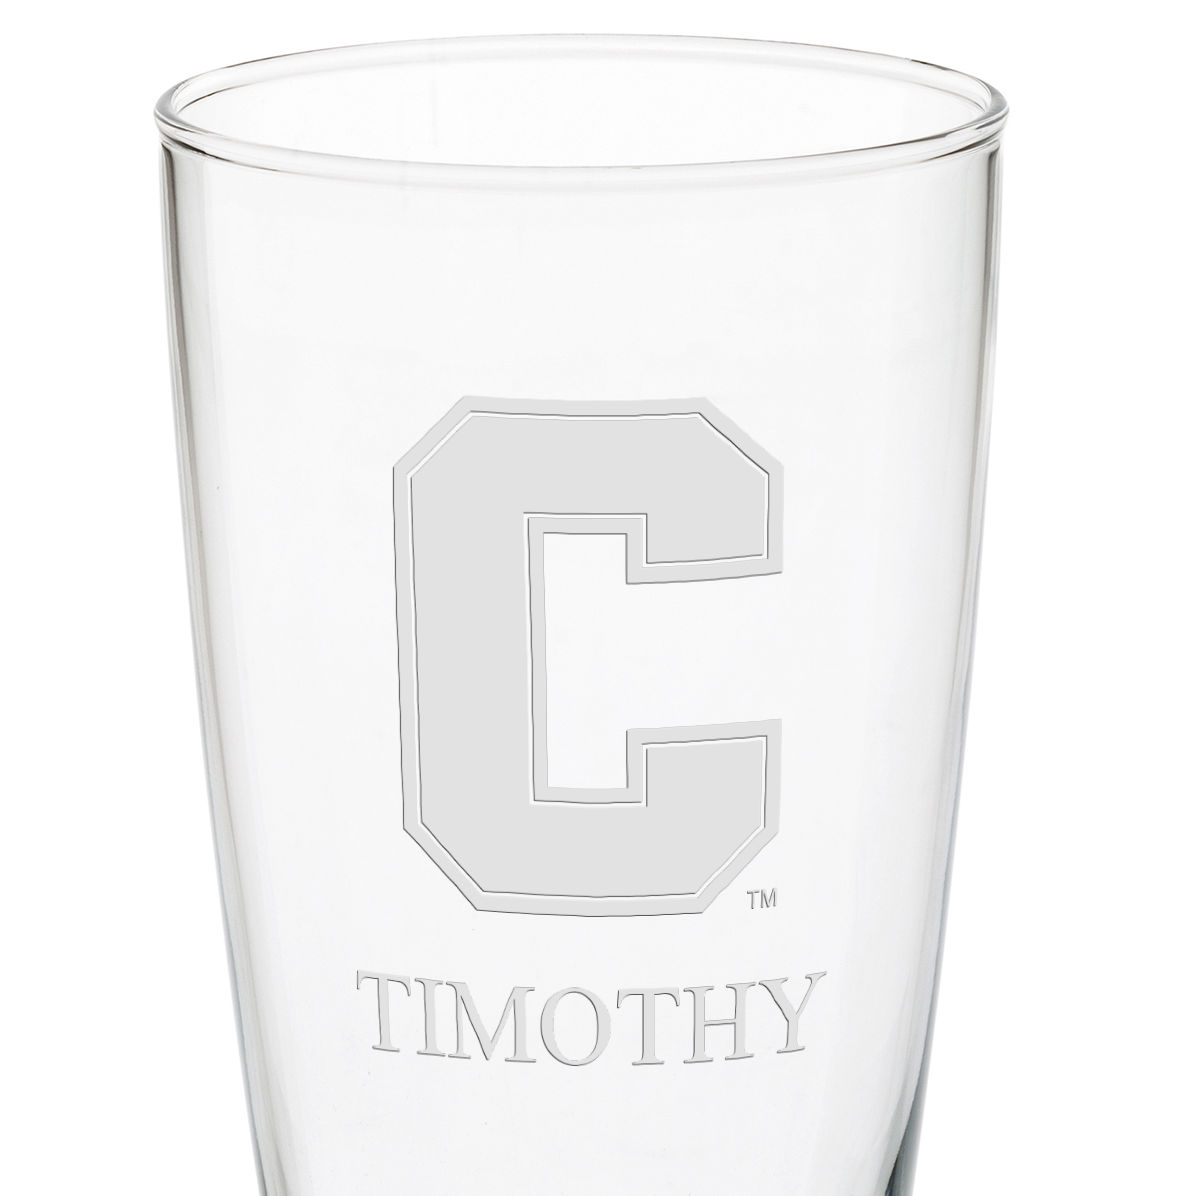 Cornell 20oz Pilsner Glasses - Set of 2 - Image 3